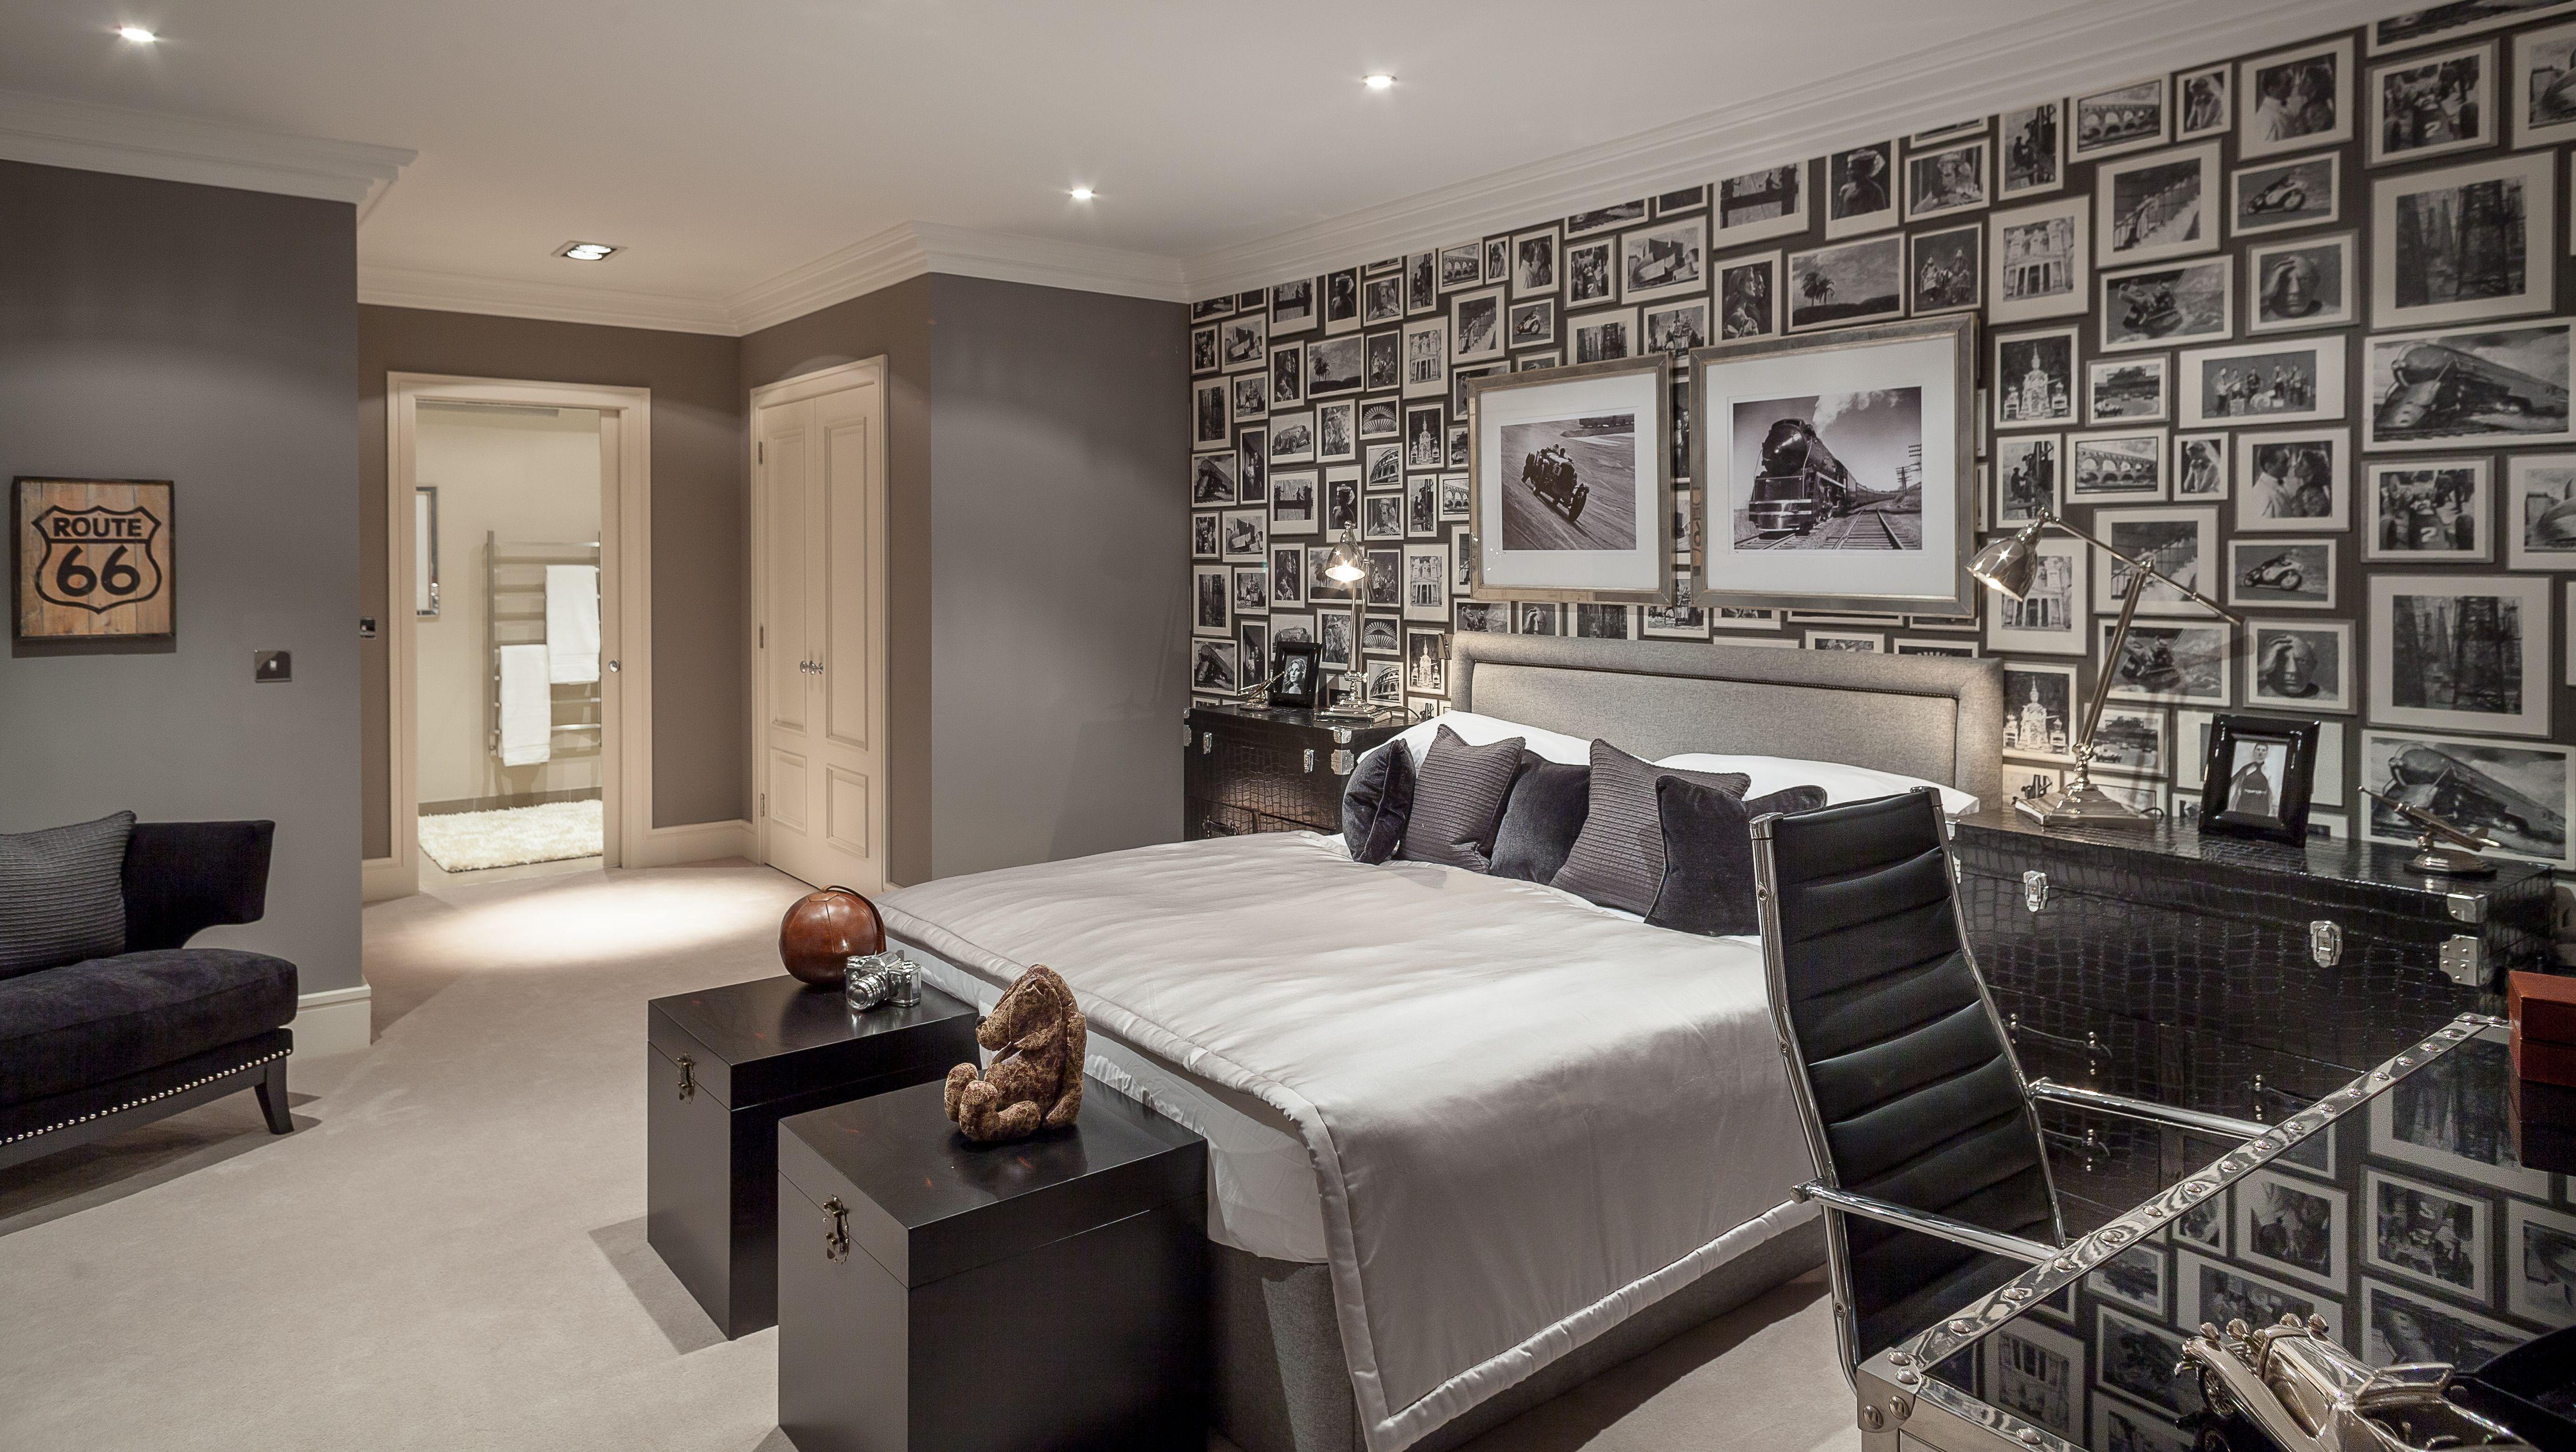 Teenage Boys Bedroom I Designed For Large House In Berkshire